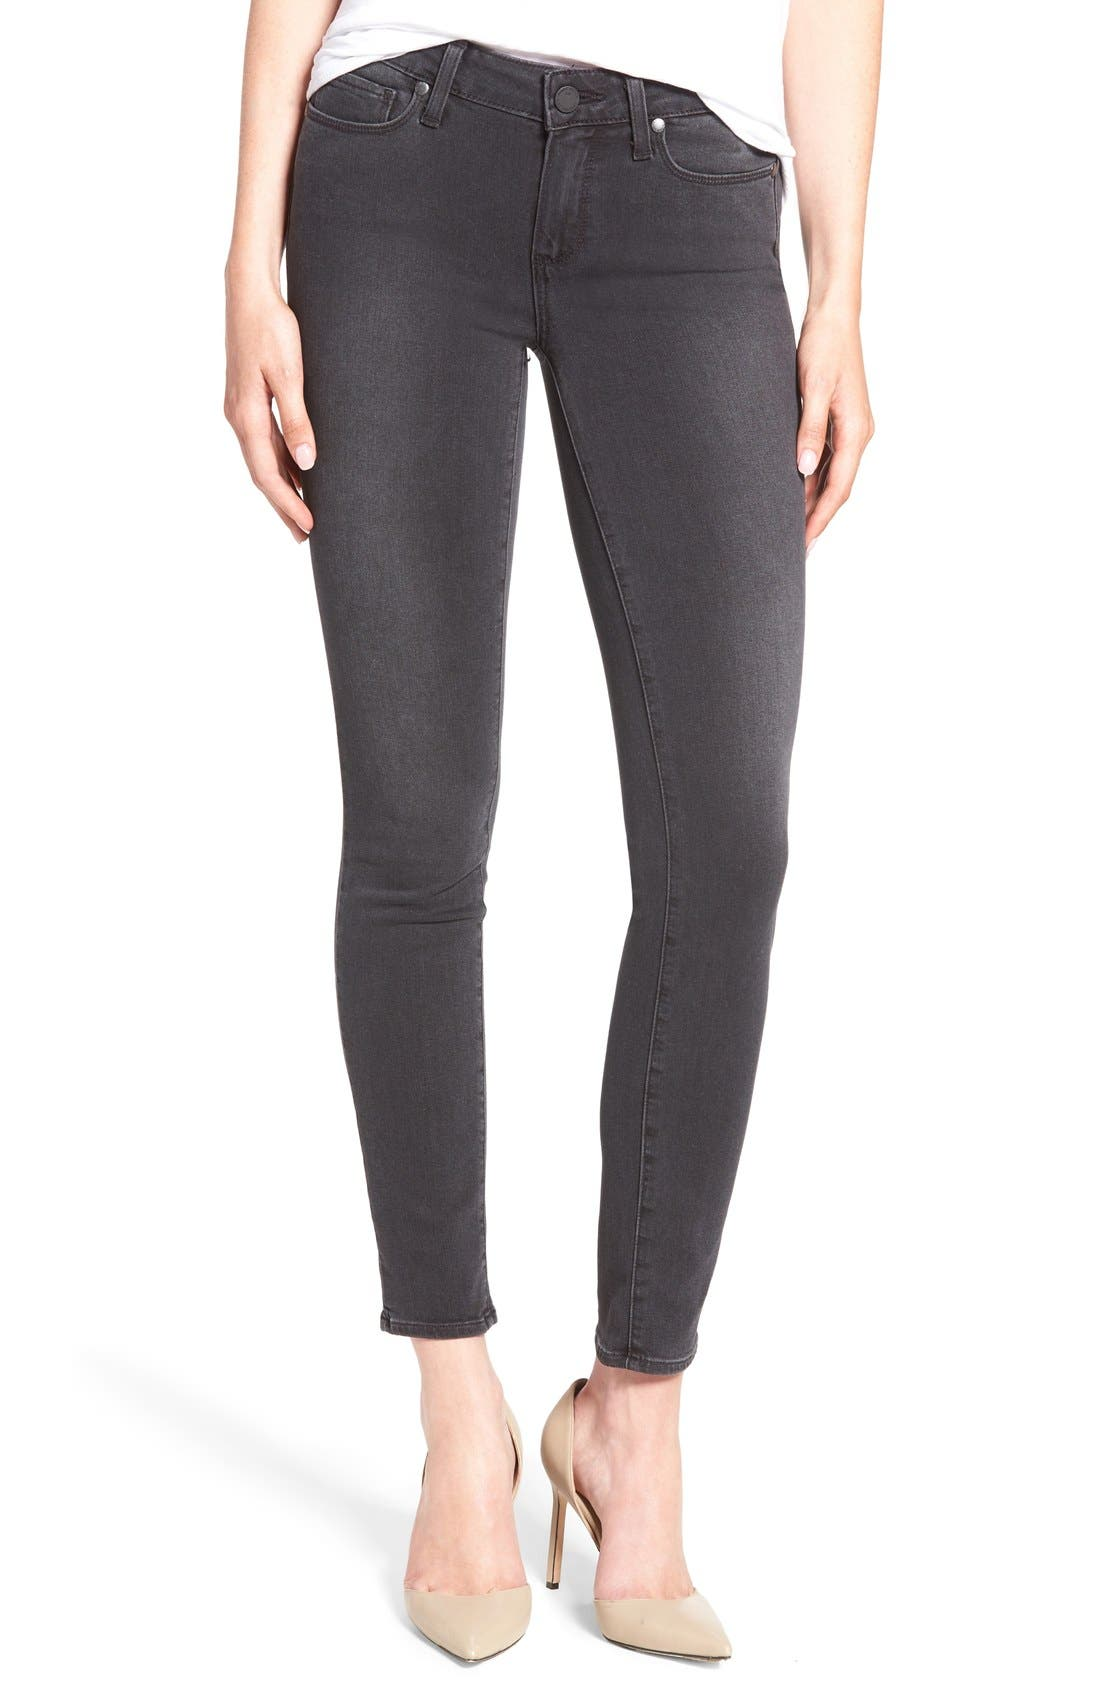 'Transcend - Verdugo' Ankle Skinny Jeans, Main, color, 020